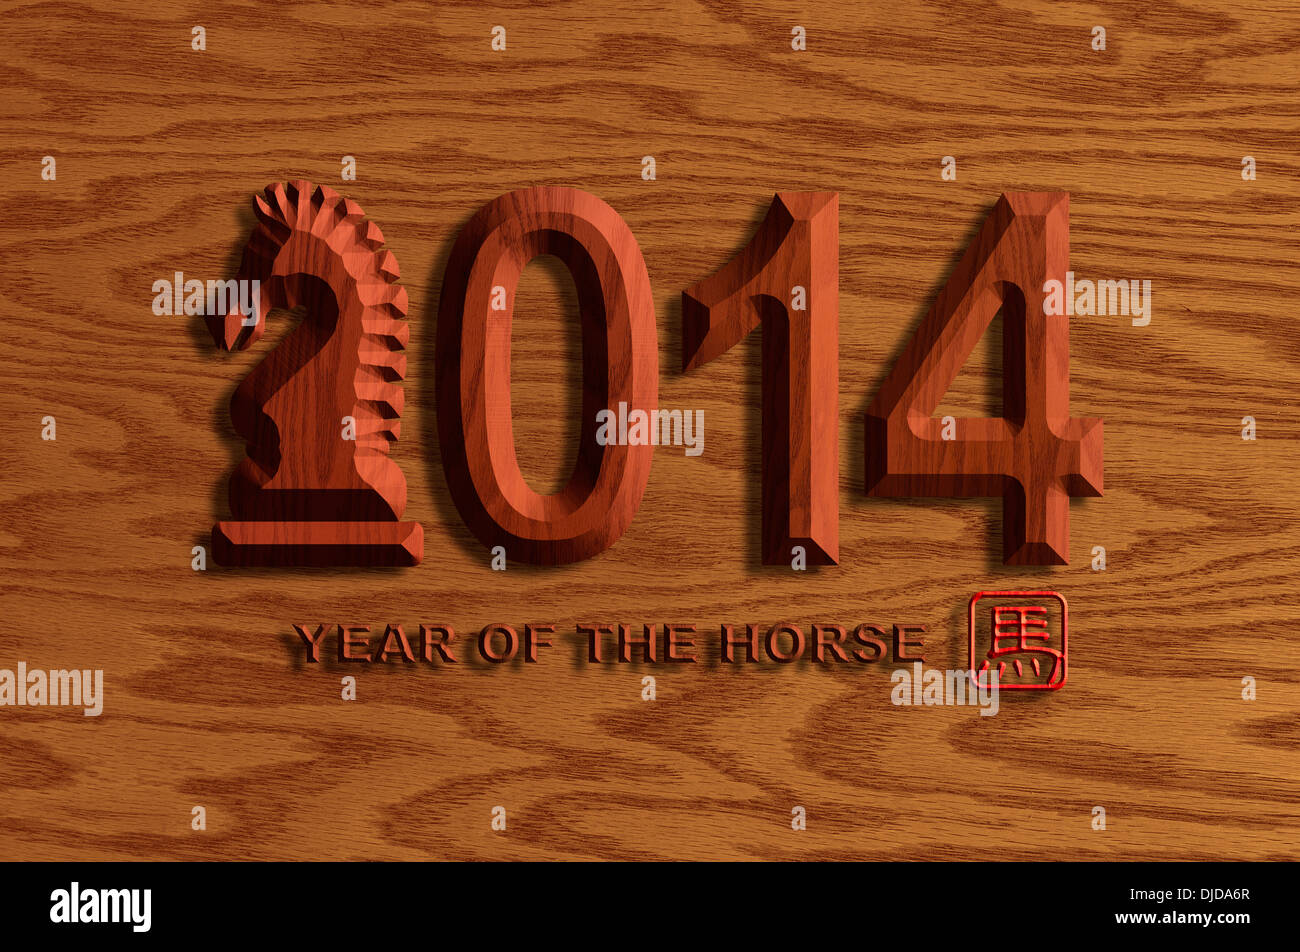 2014 chinese lunar new year of the horse wood chiseled numerals 2014 chinese lunar new year of the horse wood chiseled numerals with horse text symbol wood grain background illustration buycottarizona